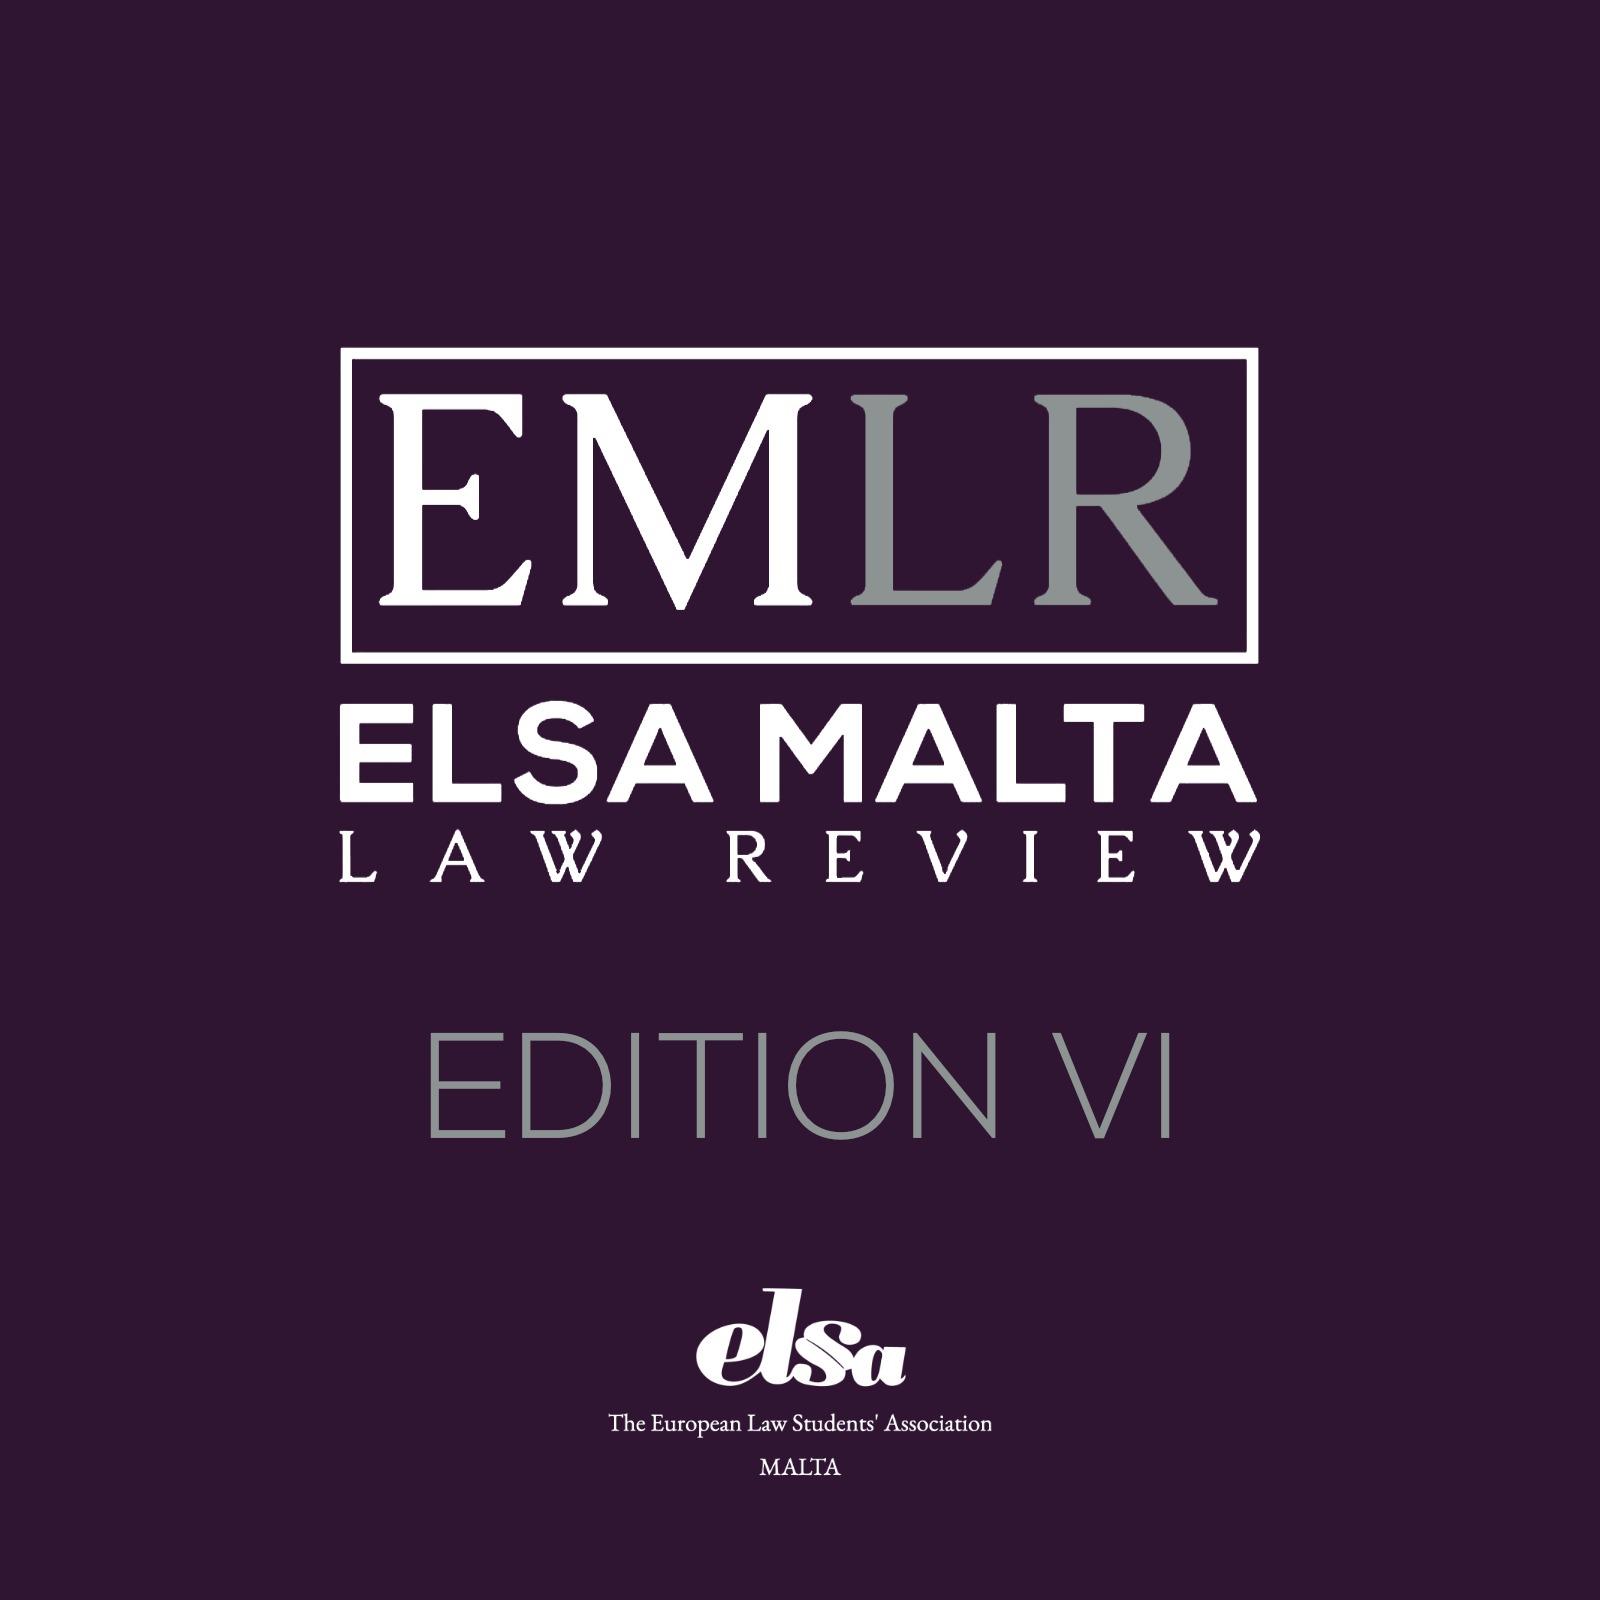 Edition VI